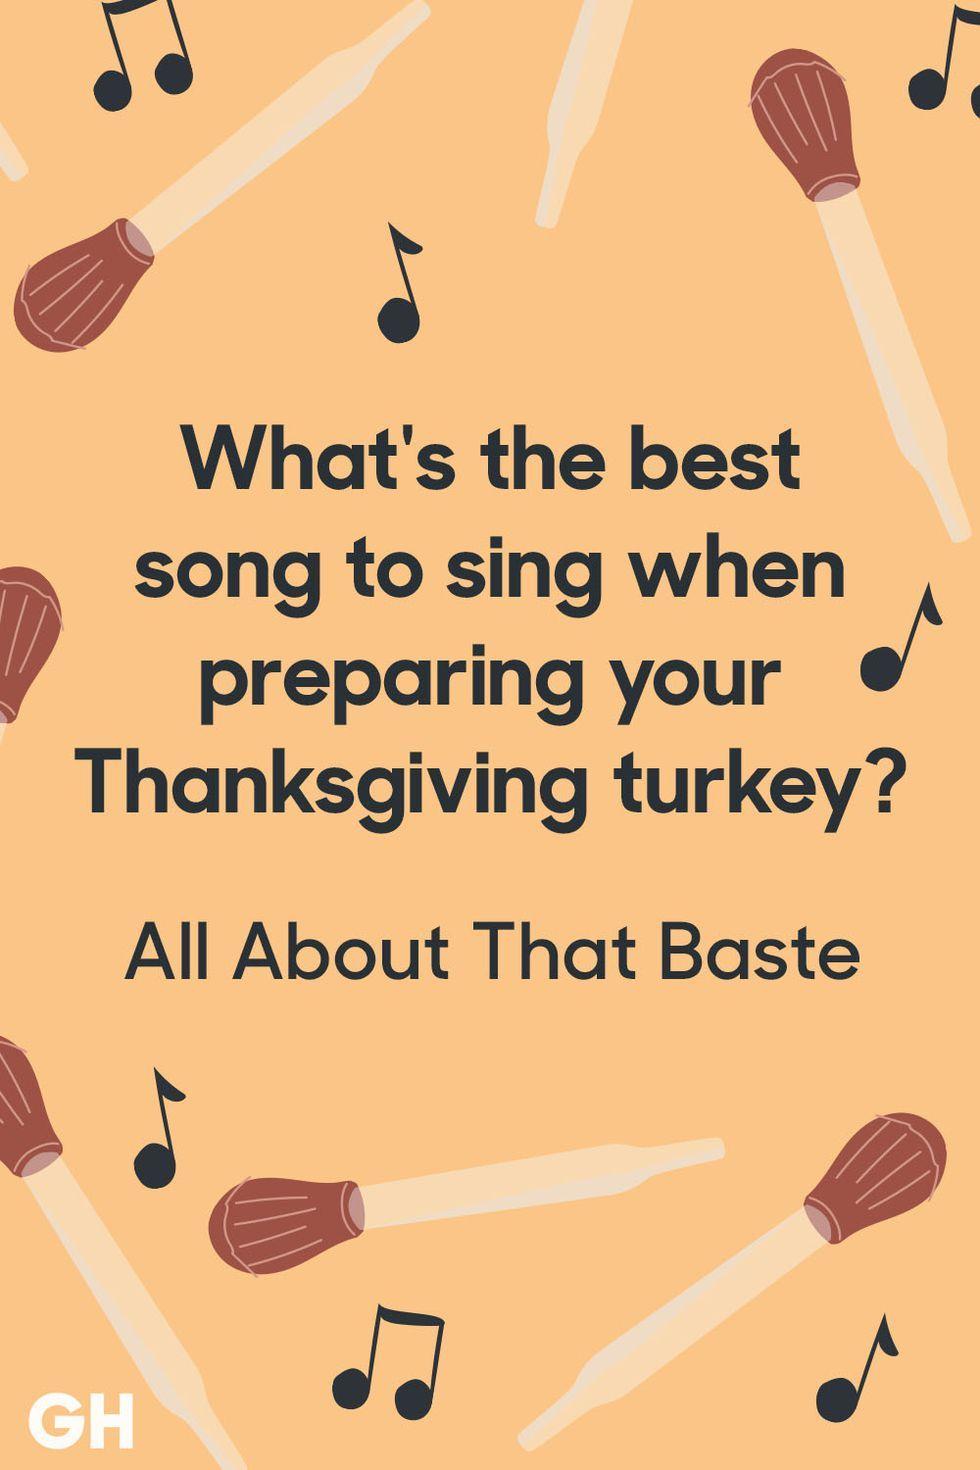 20 Corny But Hilarious Thanksgiving Jokes to Tell This